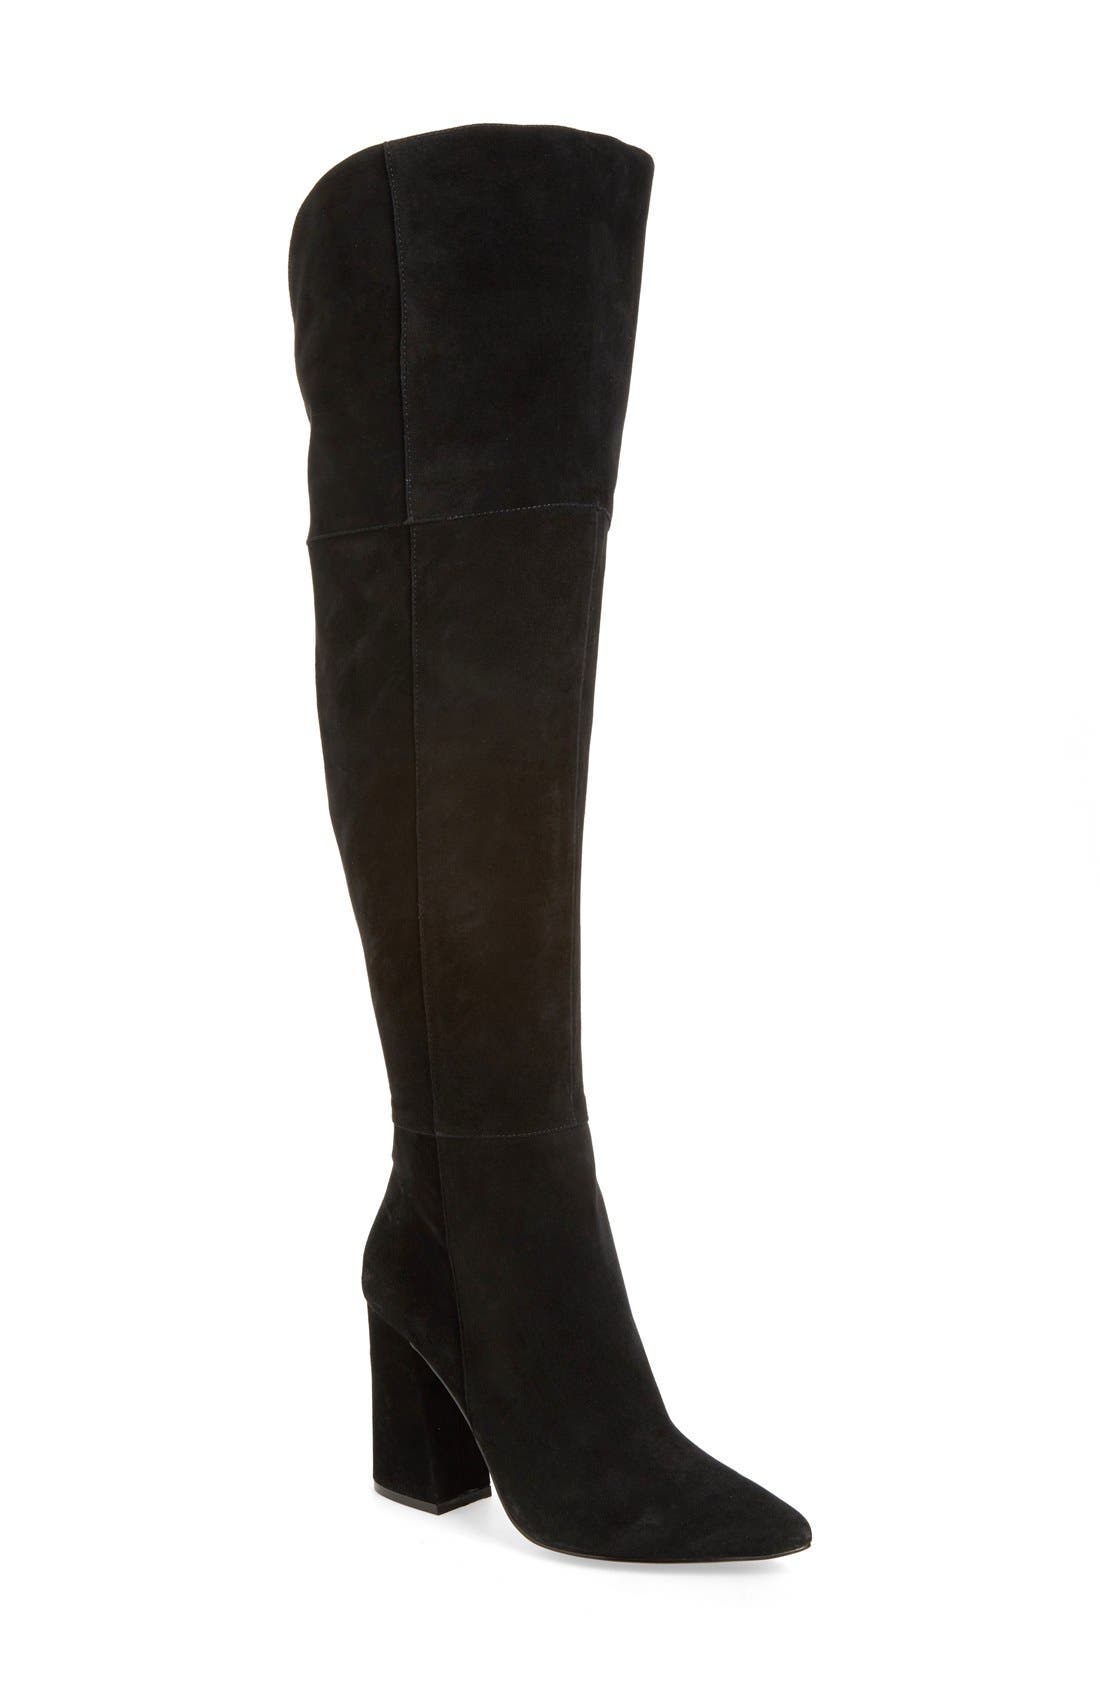 Kristin Cavallari 'Saffron' Over the Knee Boot (Women)